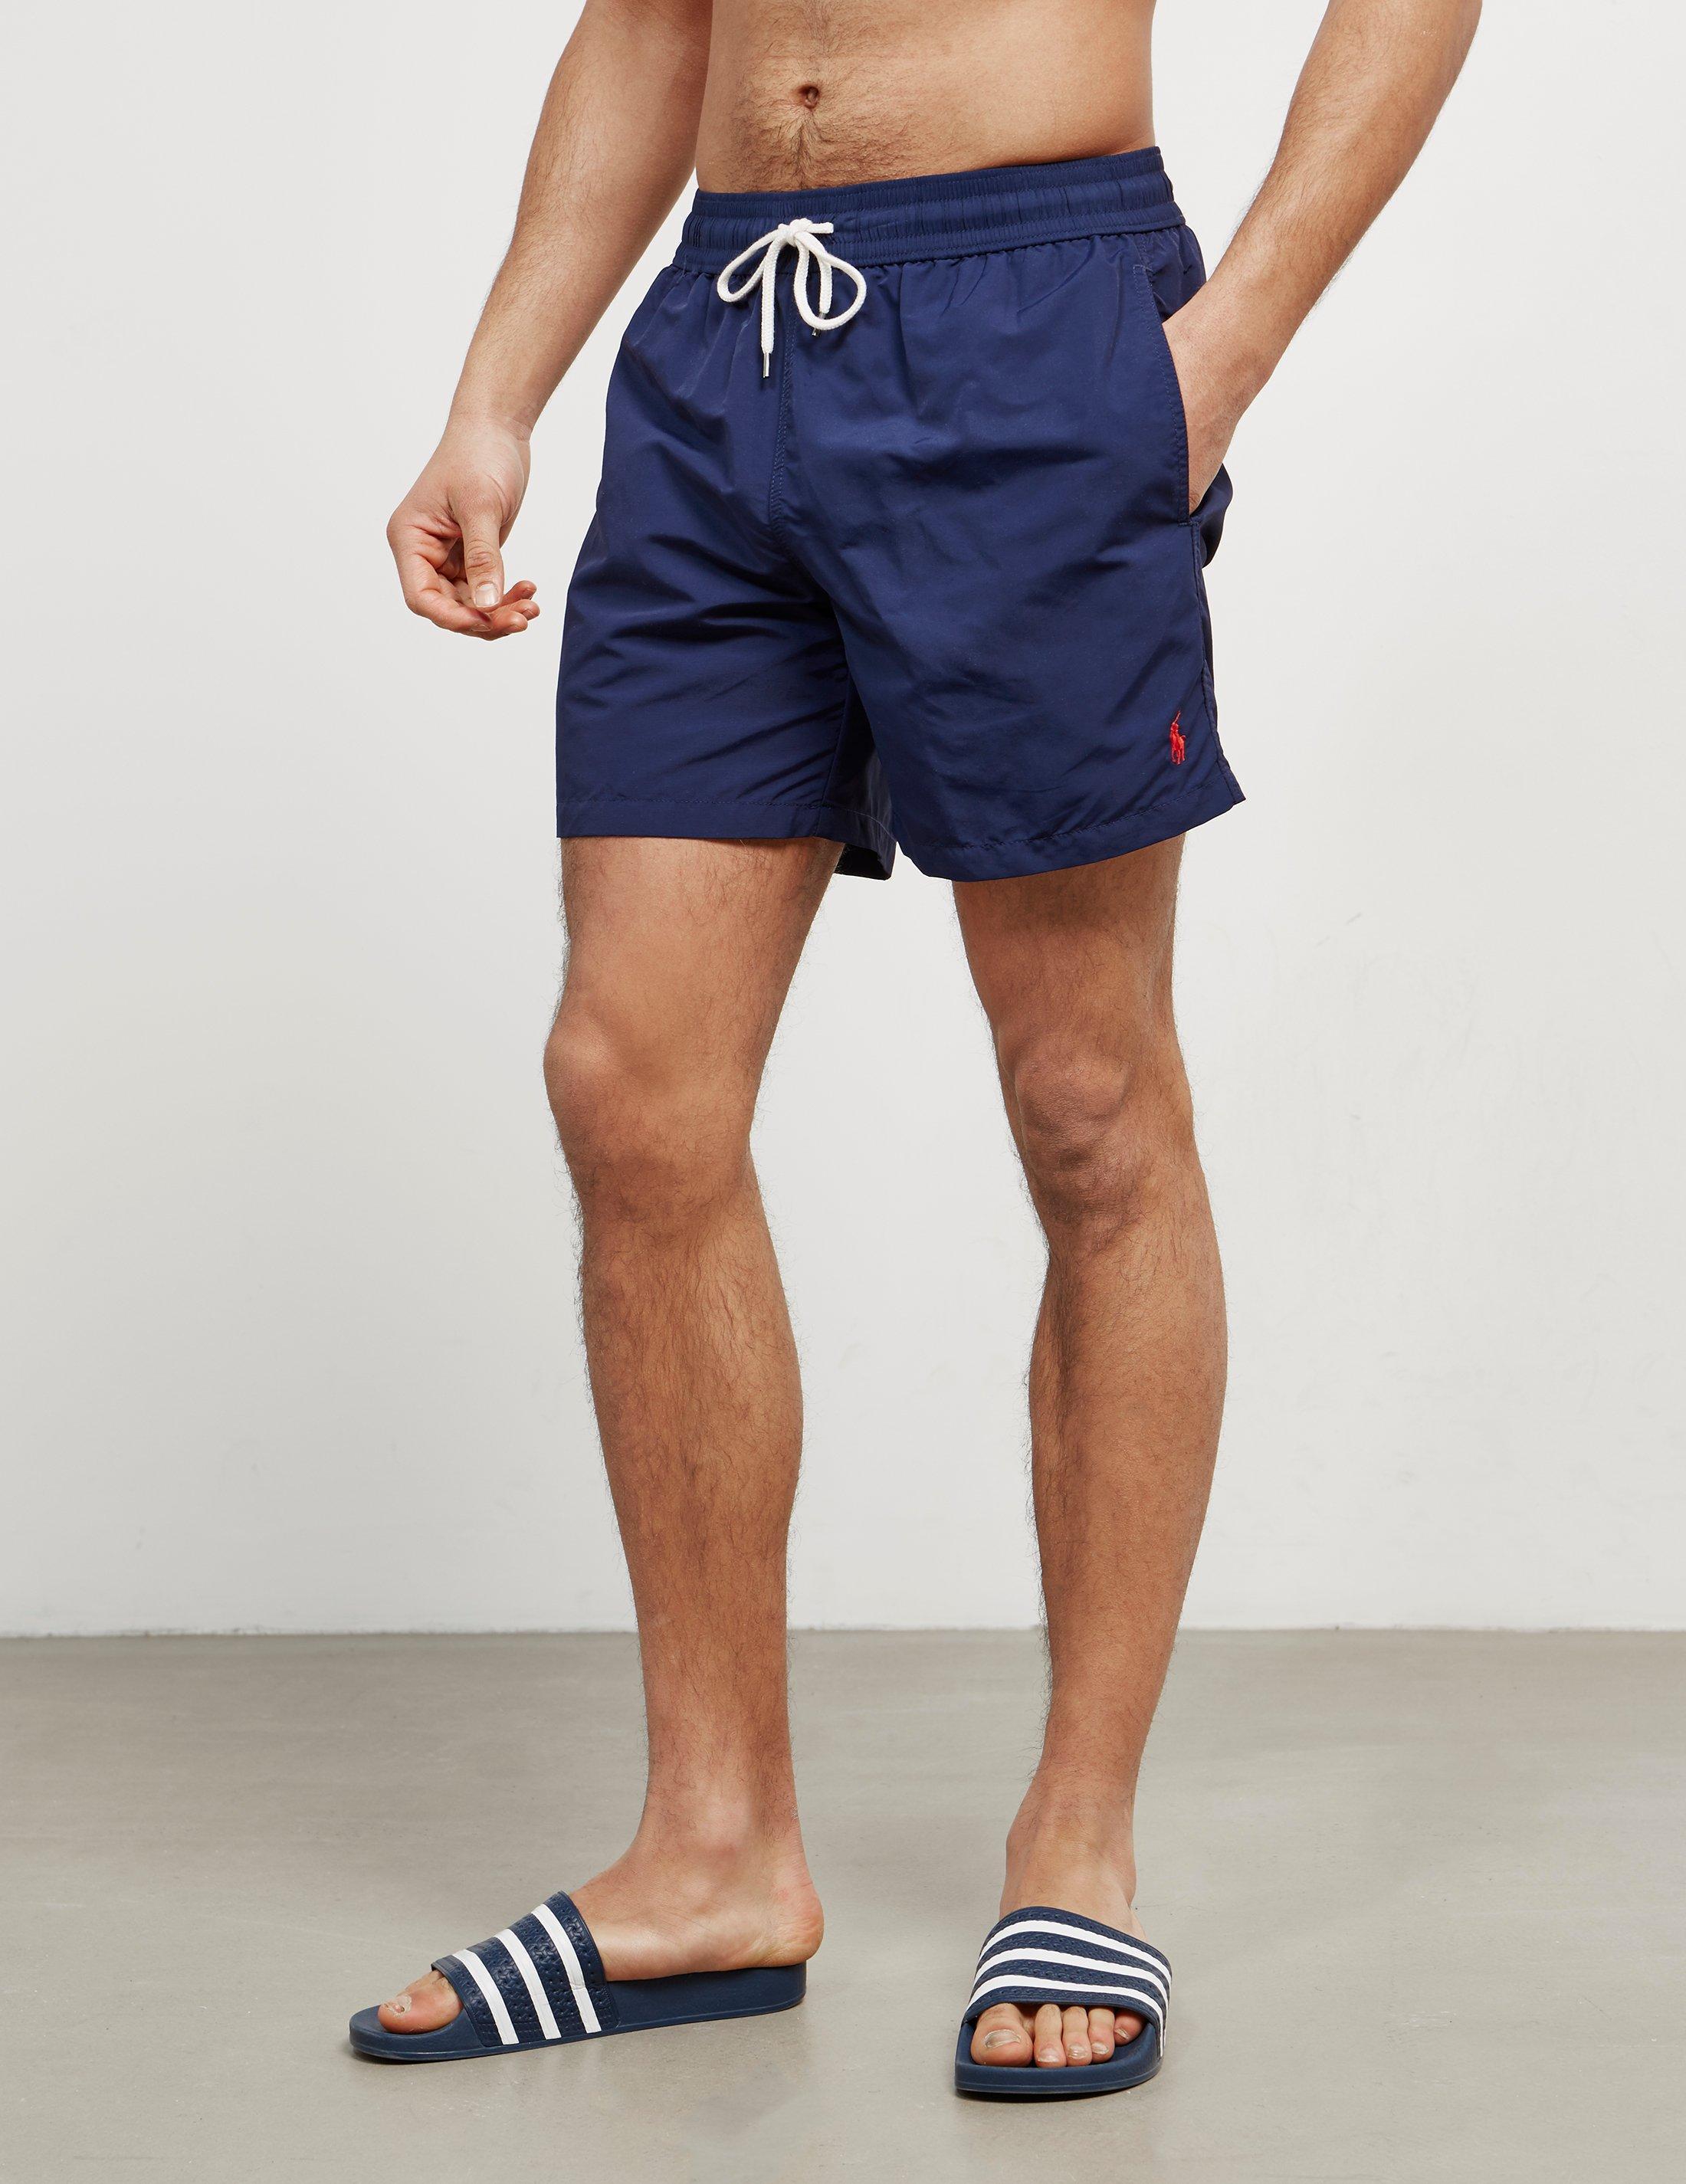 2a3139a87 ... cheapest polo ralph lauren mens basic swim shorts navy blue in blue for  men a4c3f eb4c6